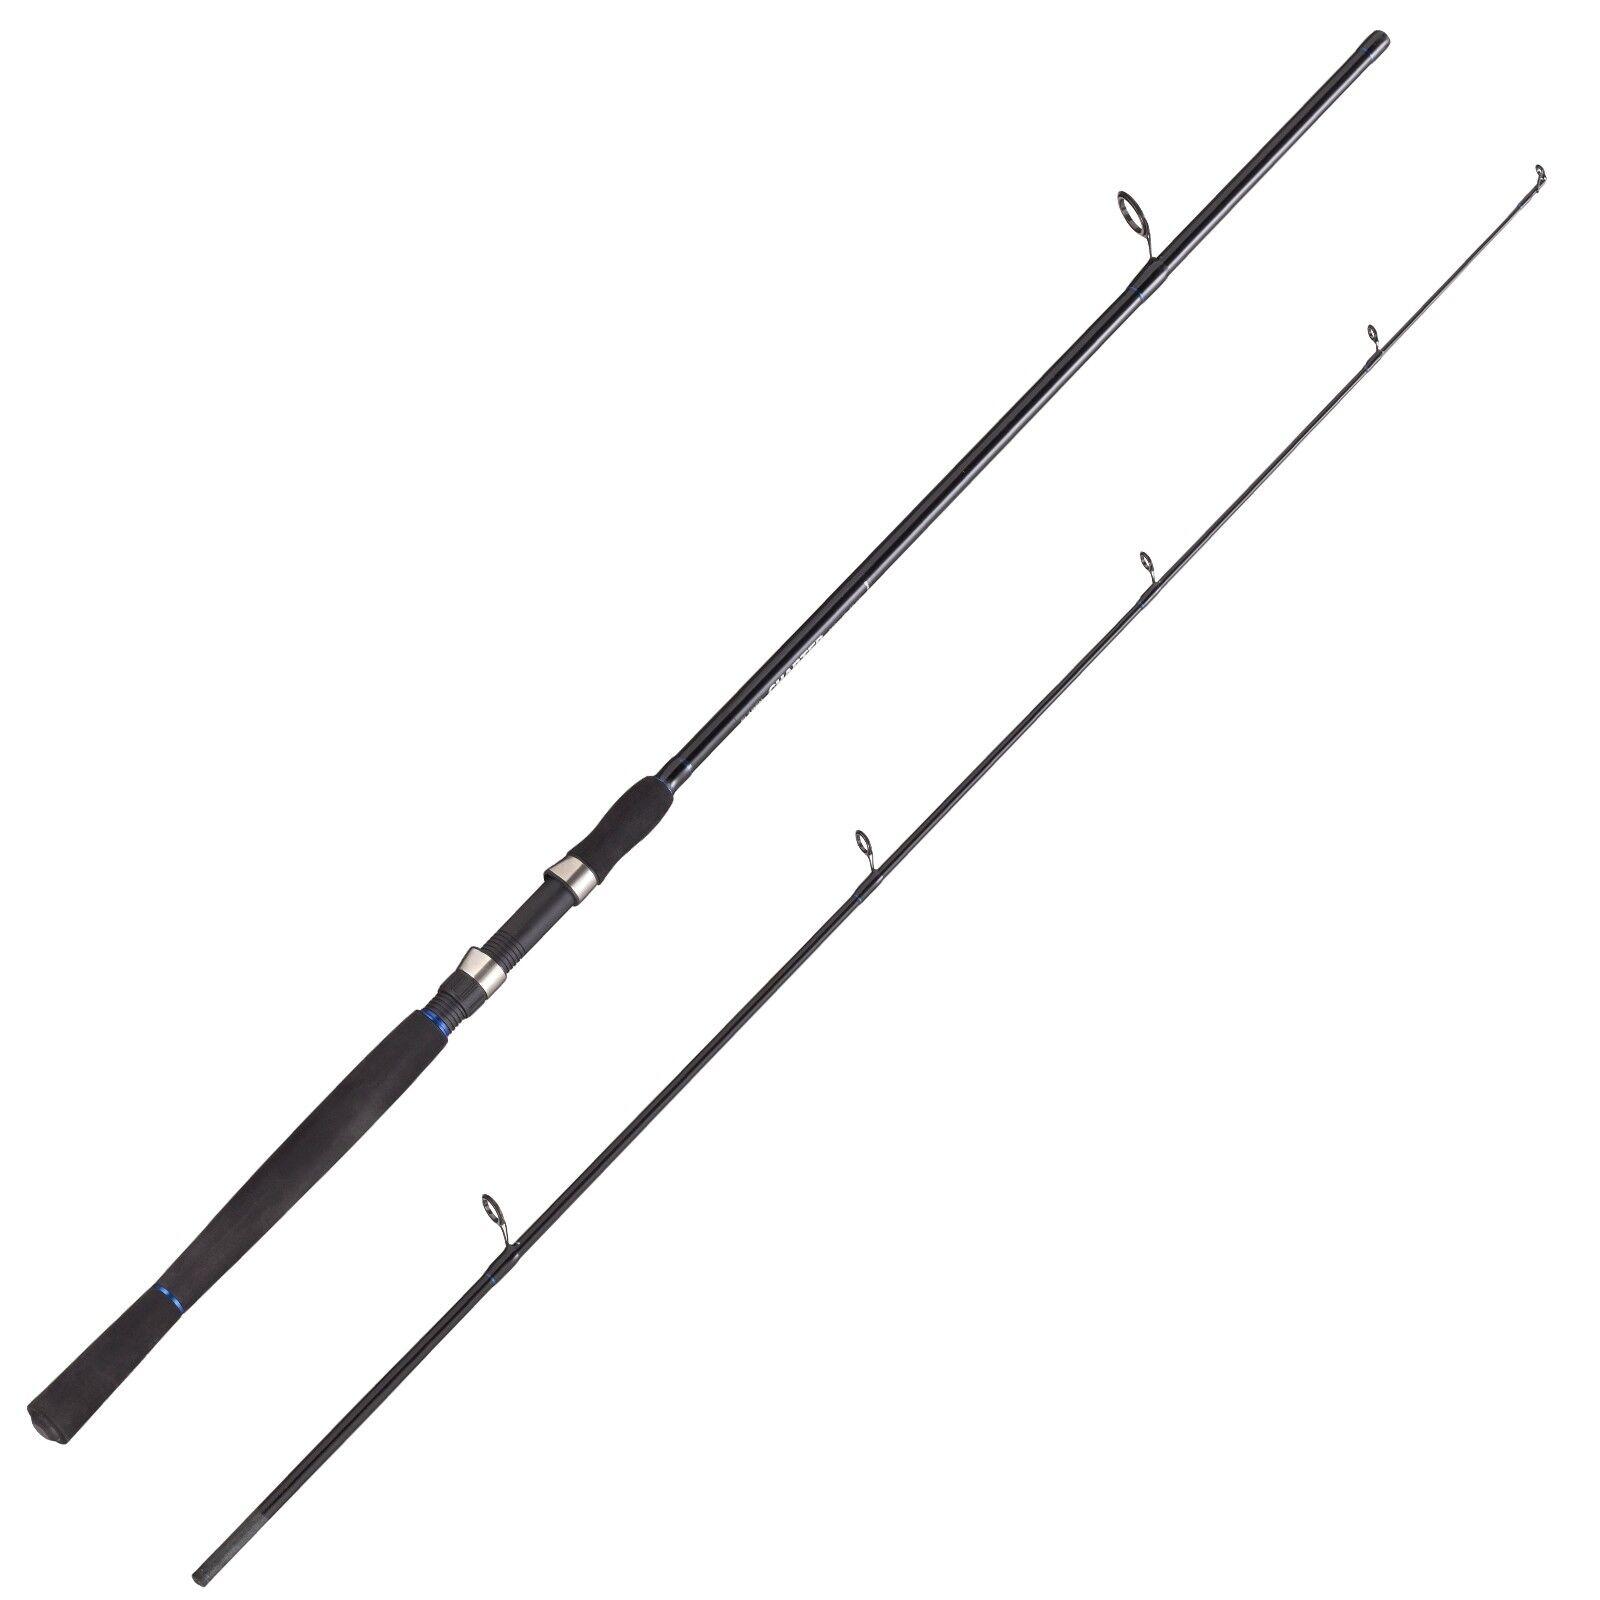 FLADEN Canna da pesca – charter tua portata 2,10m 5-20g